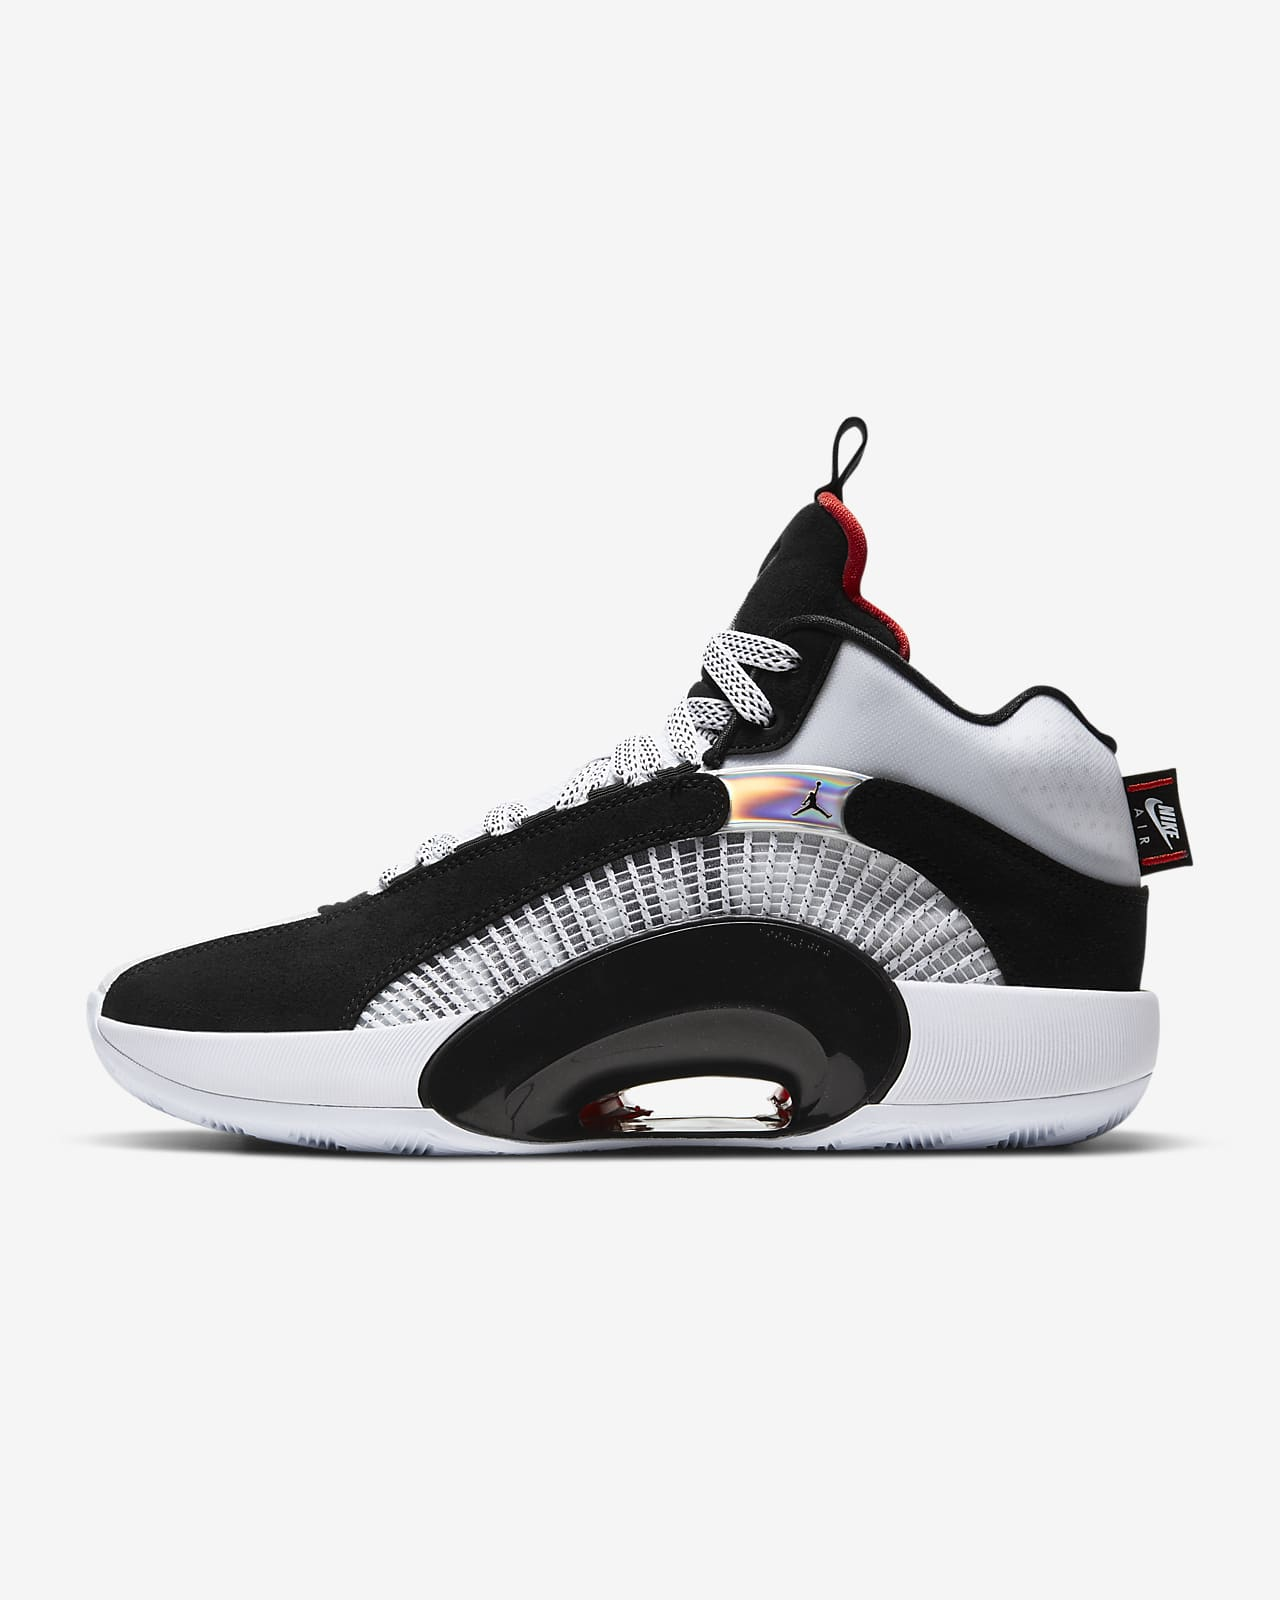 Air Jordan XXXV PF Basketball Shoes